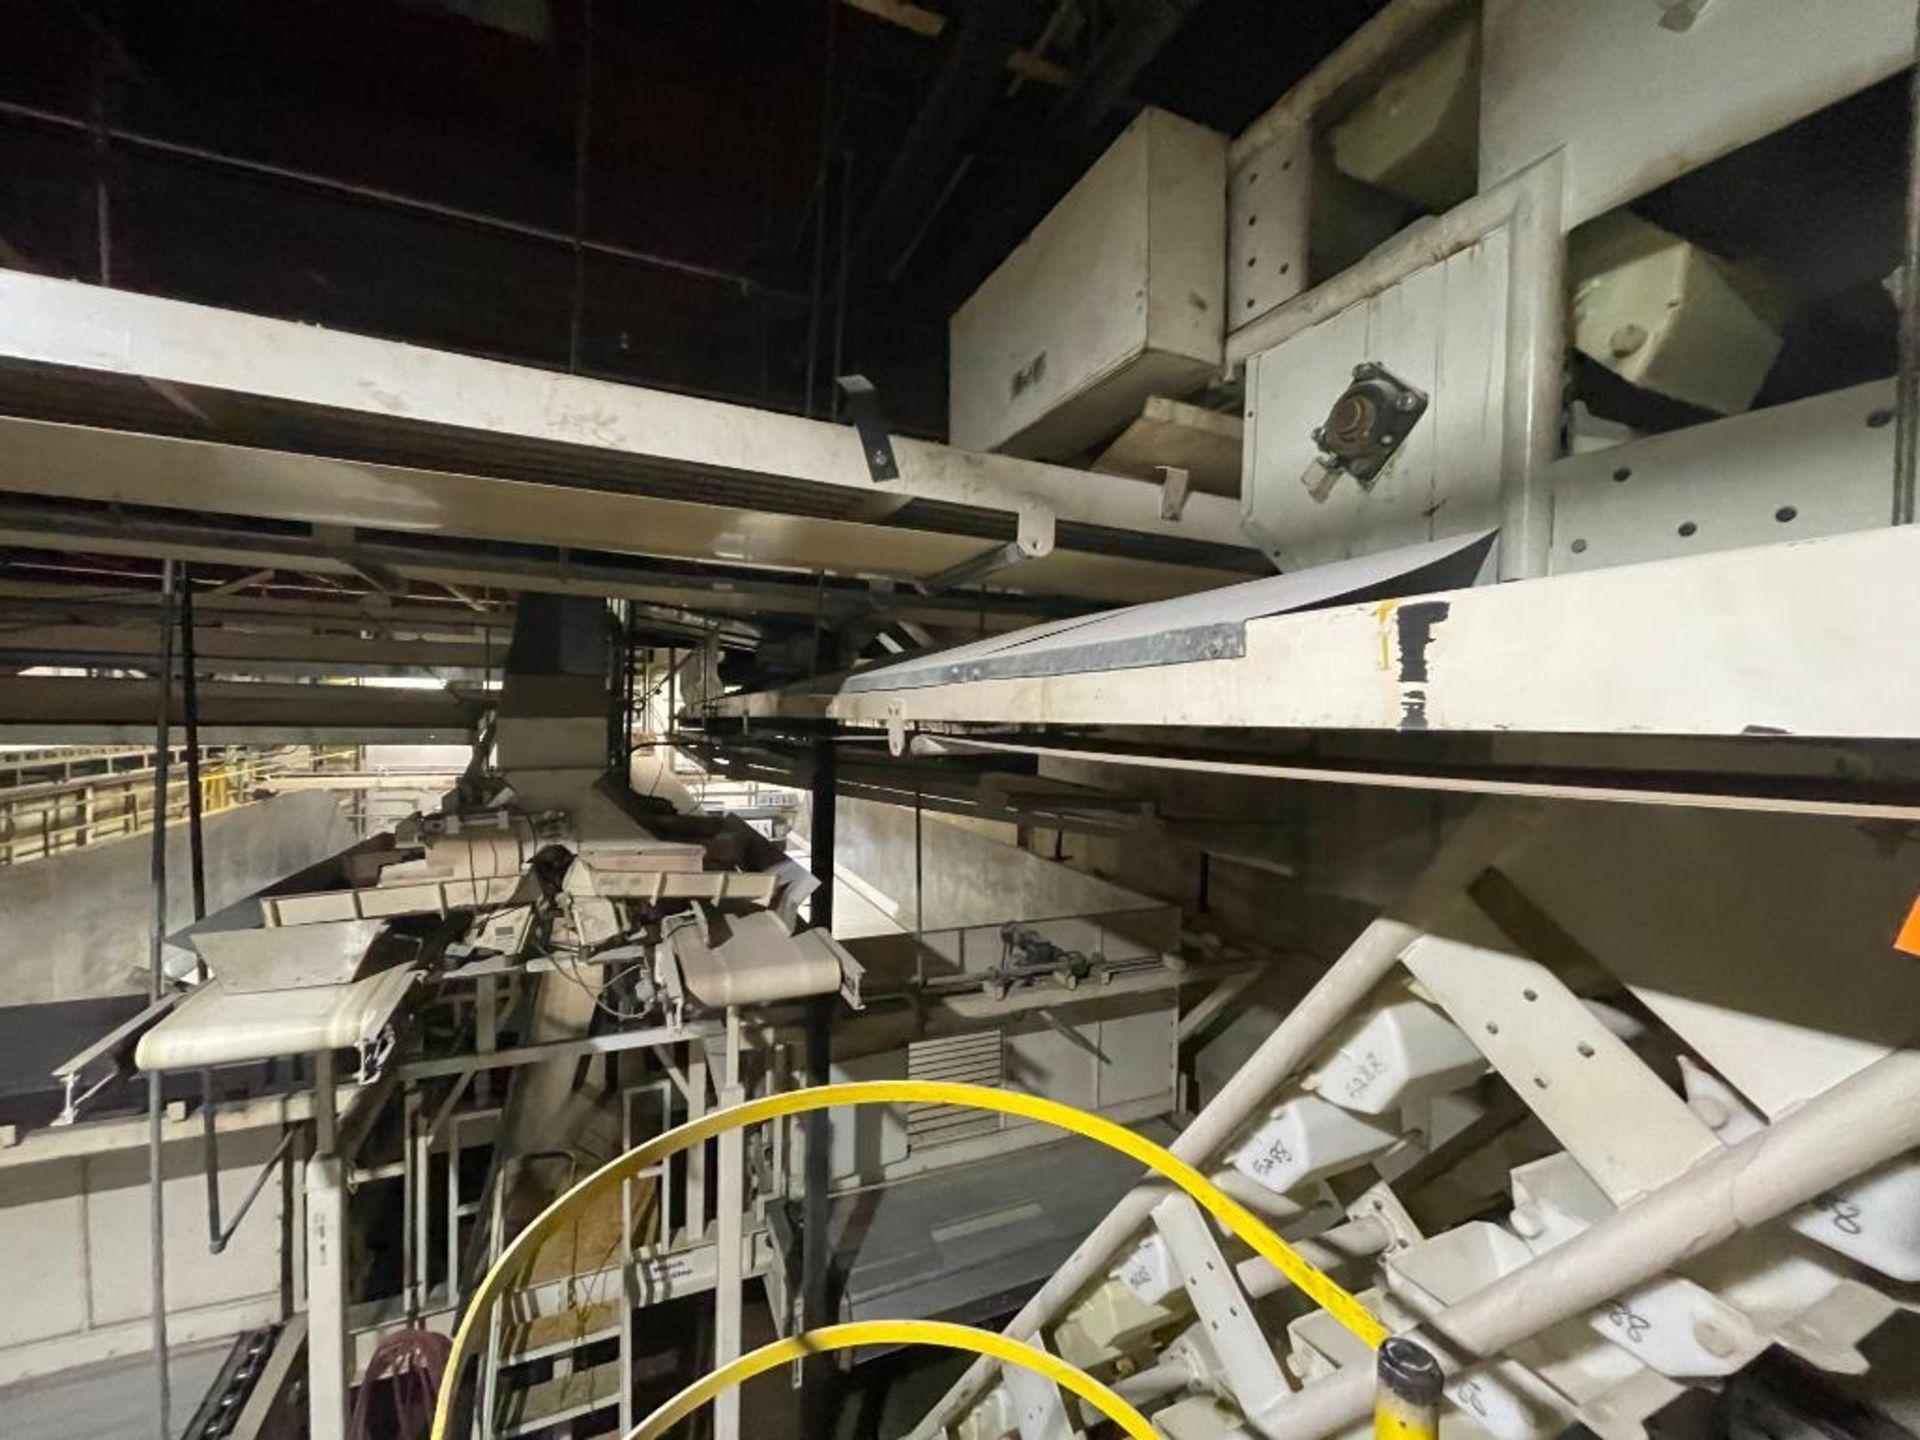 2 Aseeco horizontal overhead mild steel belt conveyors - Image 2 of 9